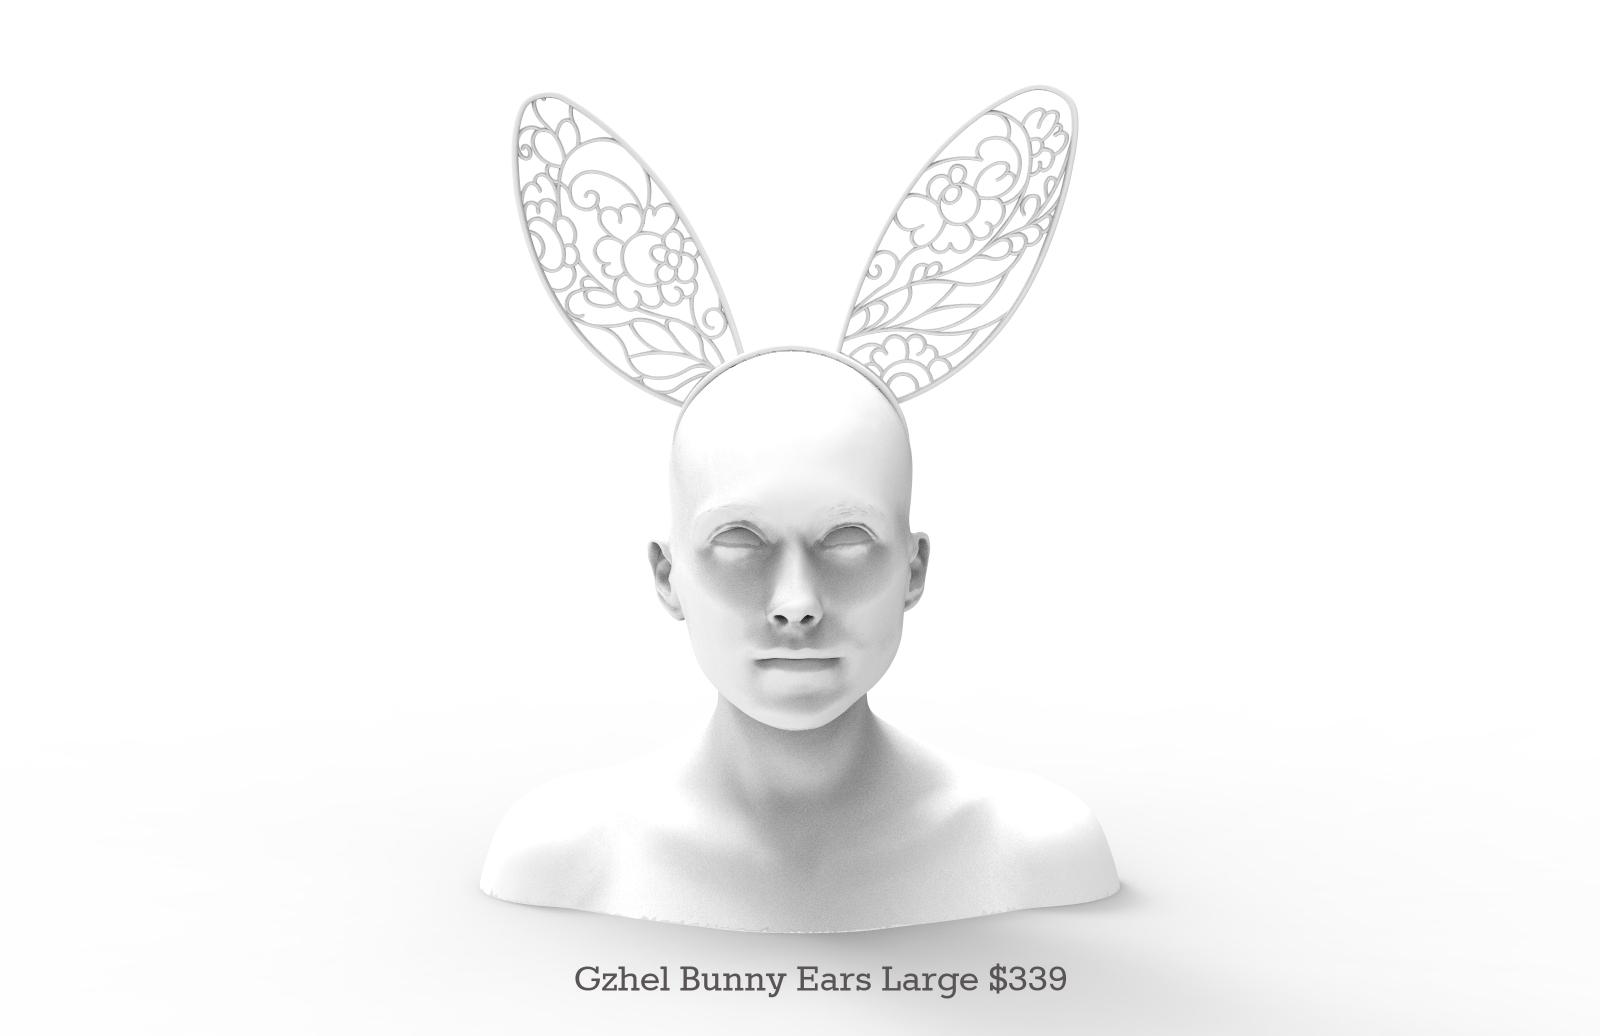 gzhel bunny ears medium_01.jpg